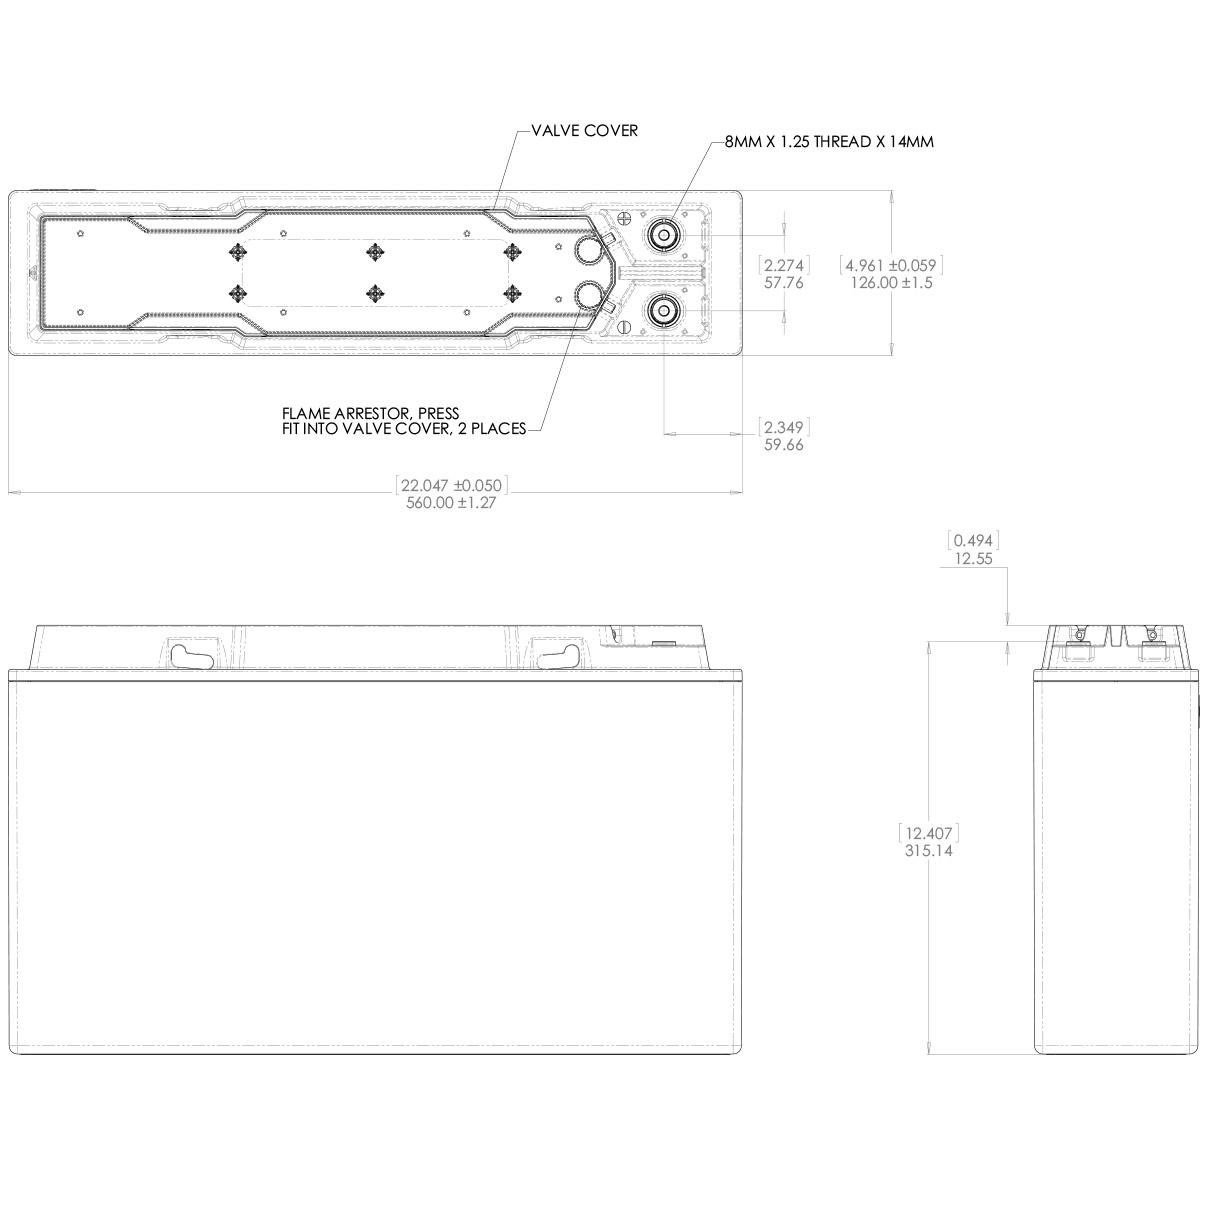 northstar-nsb-210ft-red-battery-dimensions.jpg